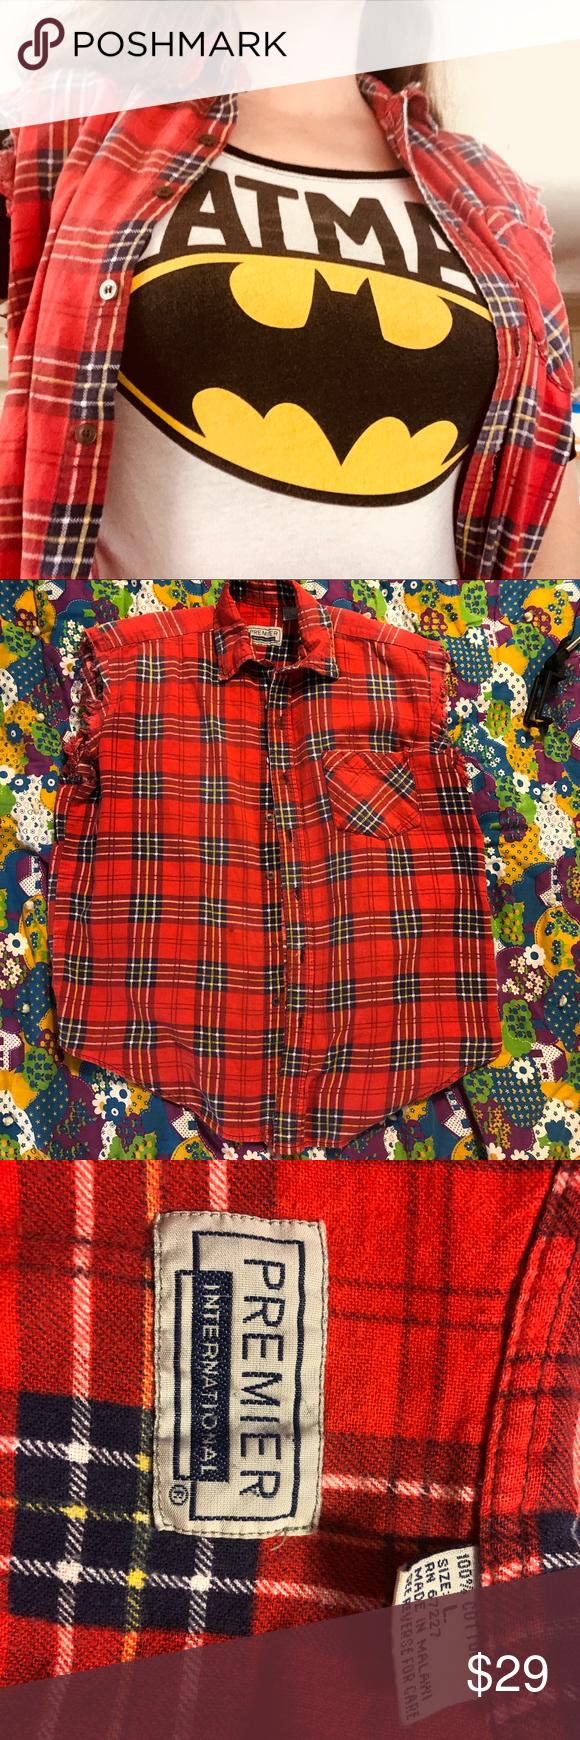 Flannel into dress  Authentic s grunge flannel sleeveless shirt vest  My Posh Closet